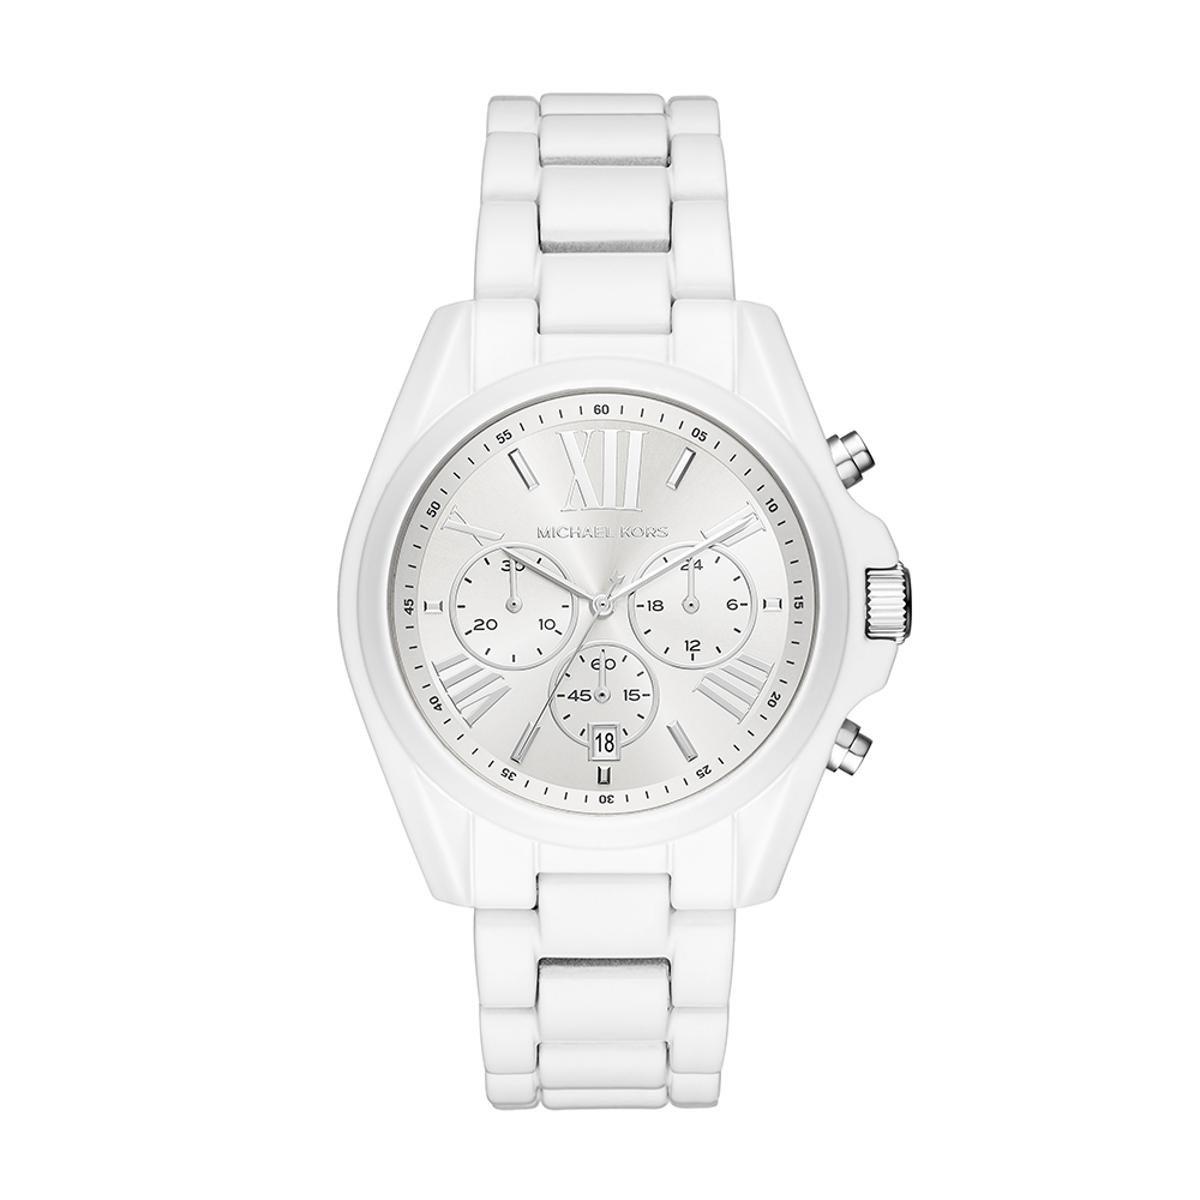 e82b09119f94d Relógio Michael Kors Feminino Bradshaw - MK6585 1BN MK6585 1BN ...